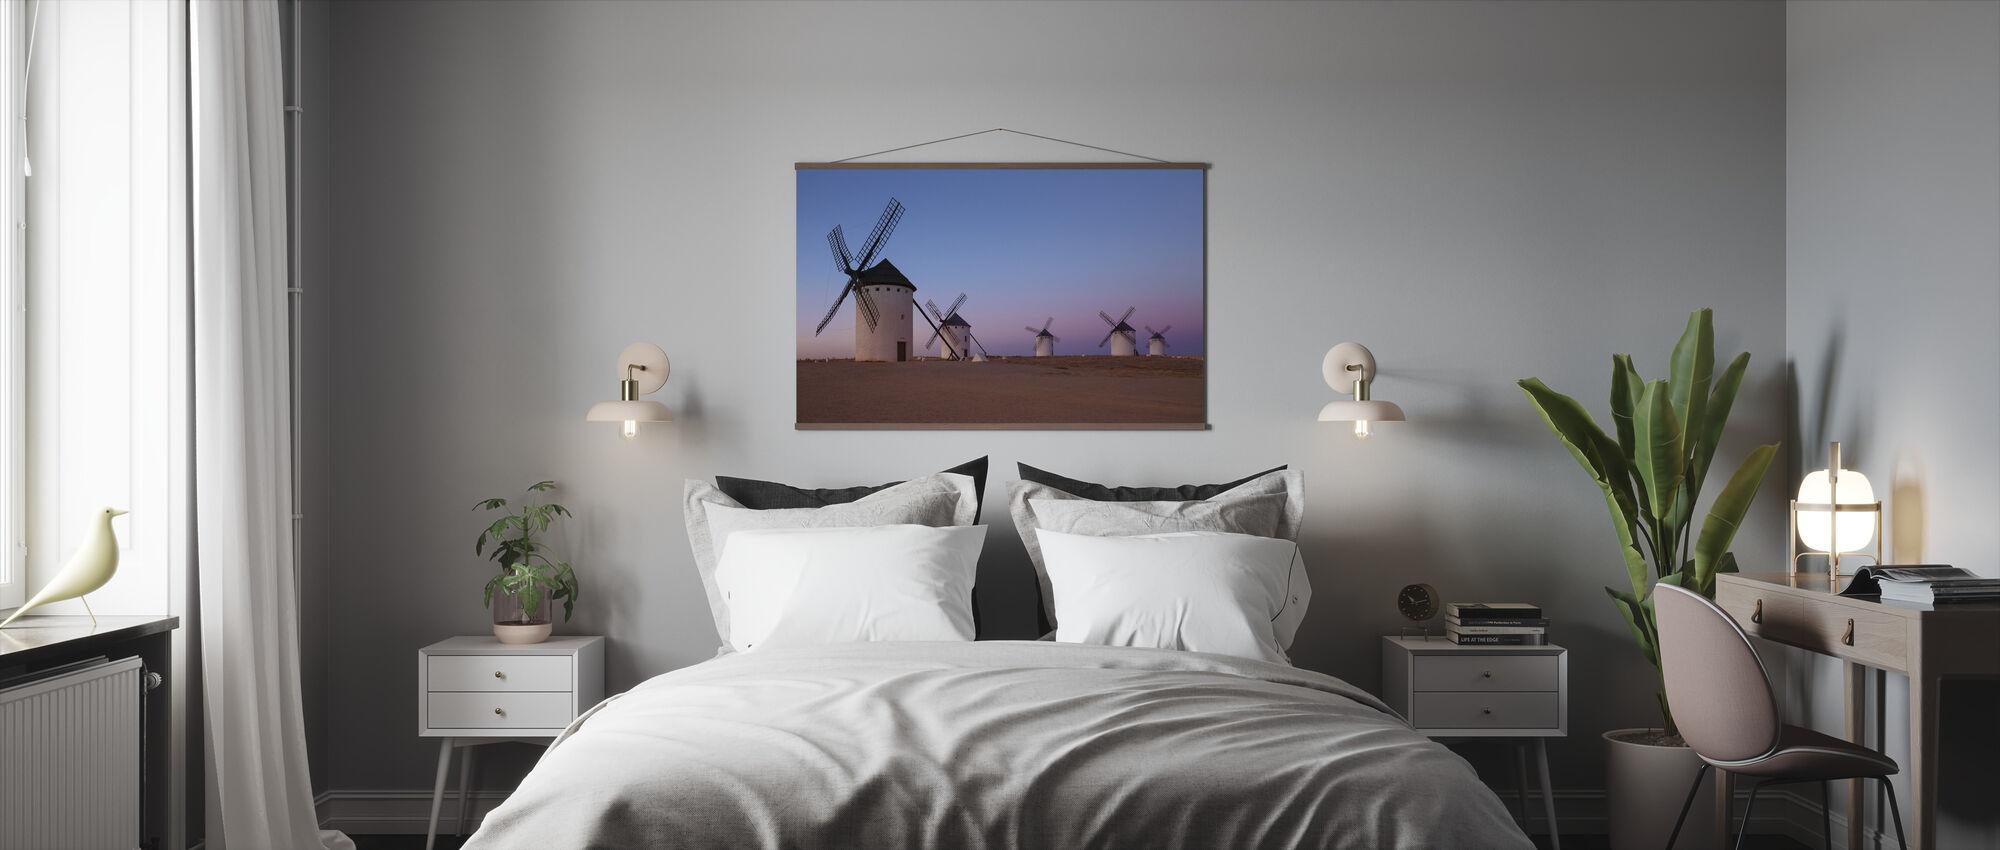 Windmolens van La Mancha - Poster - Slaapkamer